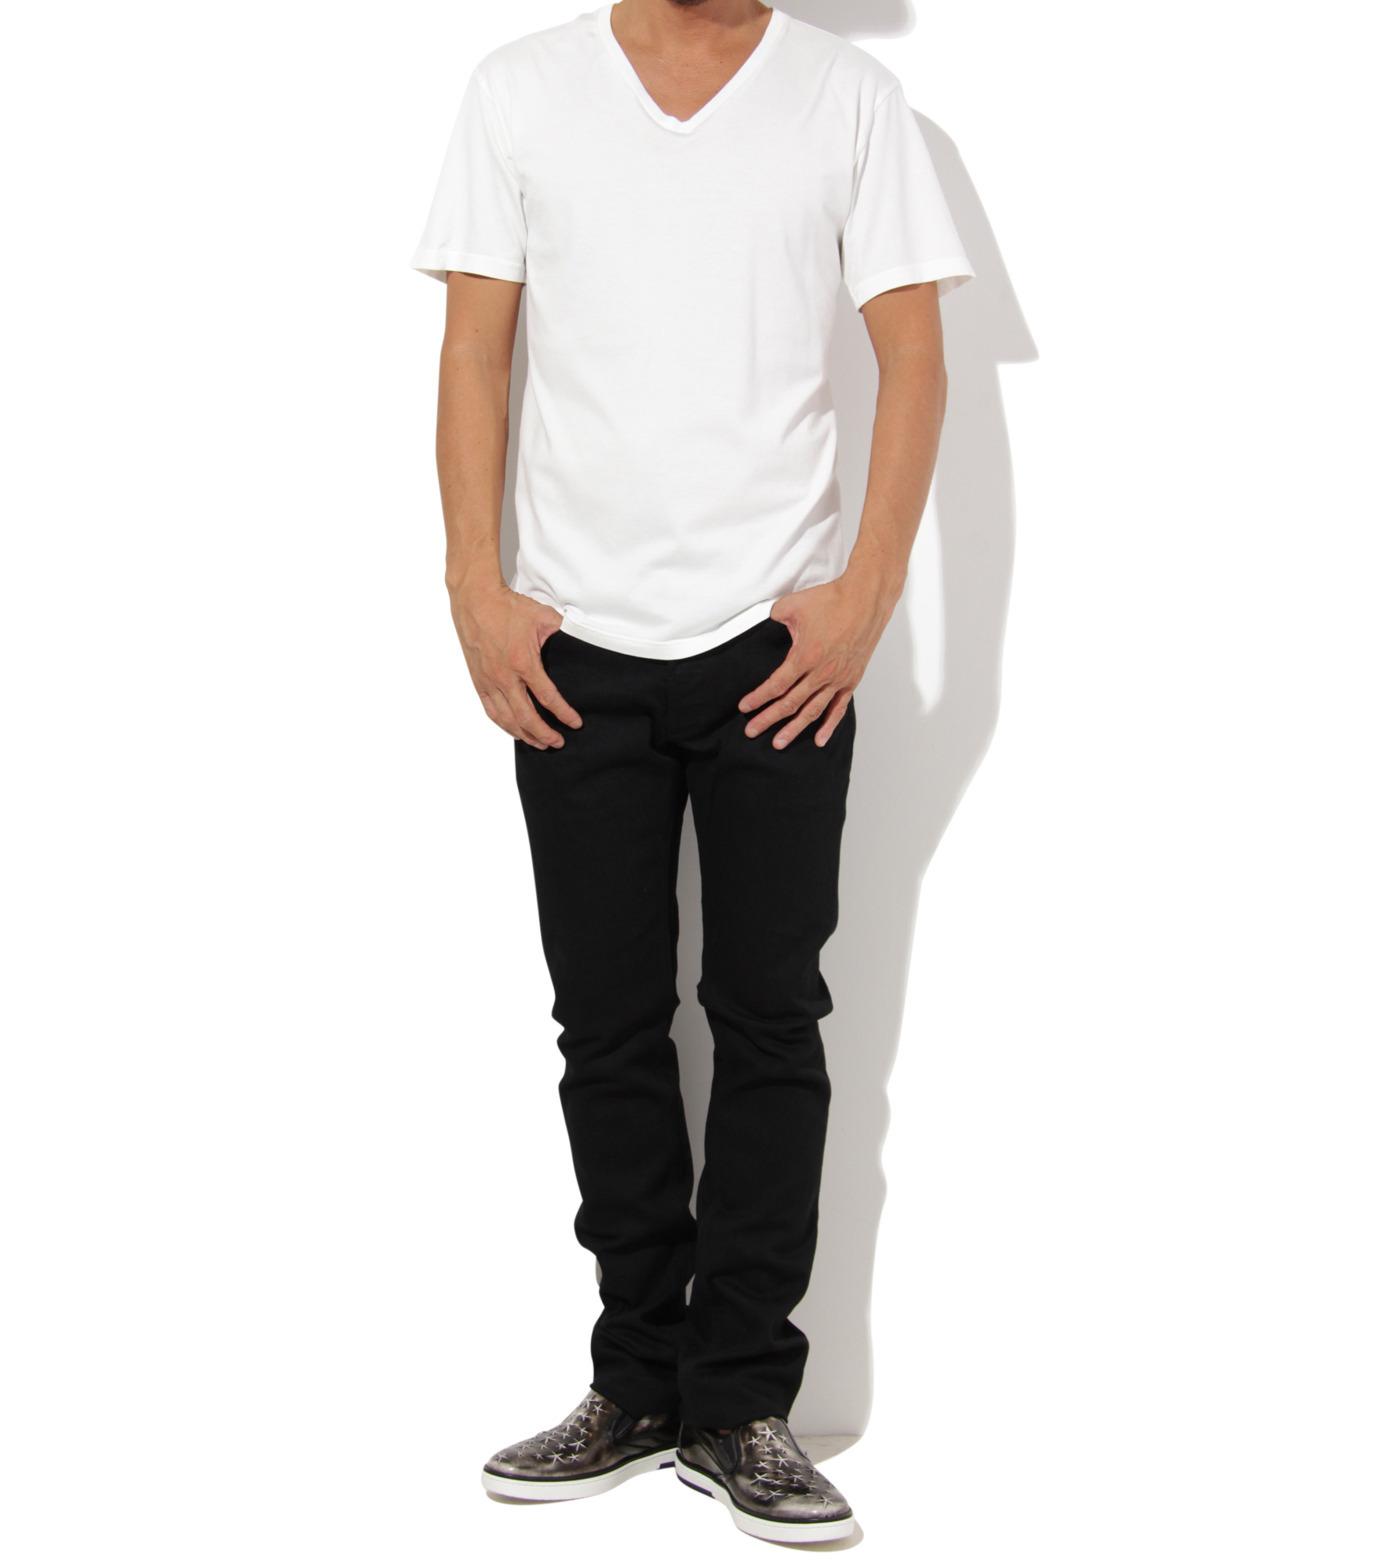 Heddie Lovu(エディー ルーヴ)のV NECK 【SLIM】-WHITE(カットソー/cut and sewn)-ST-S2-00-14A 拡大詳細画像3